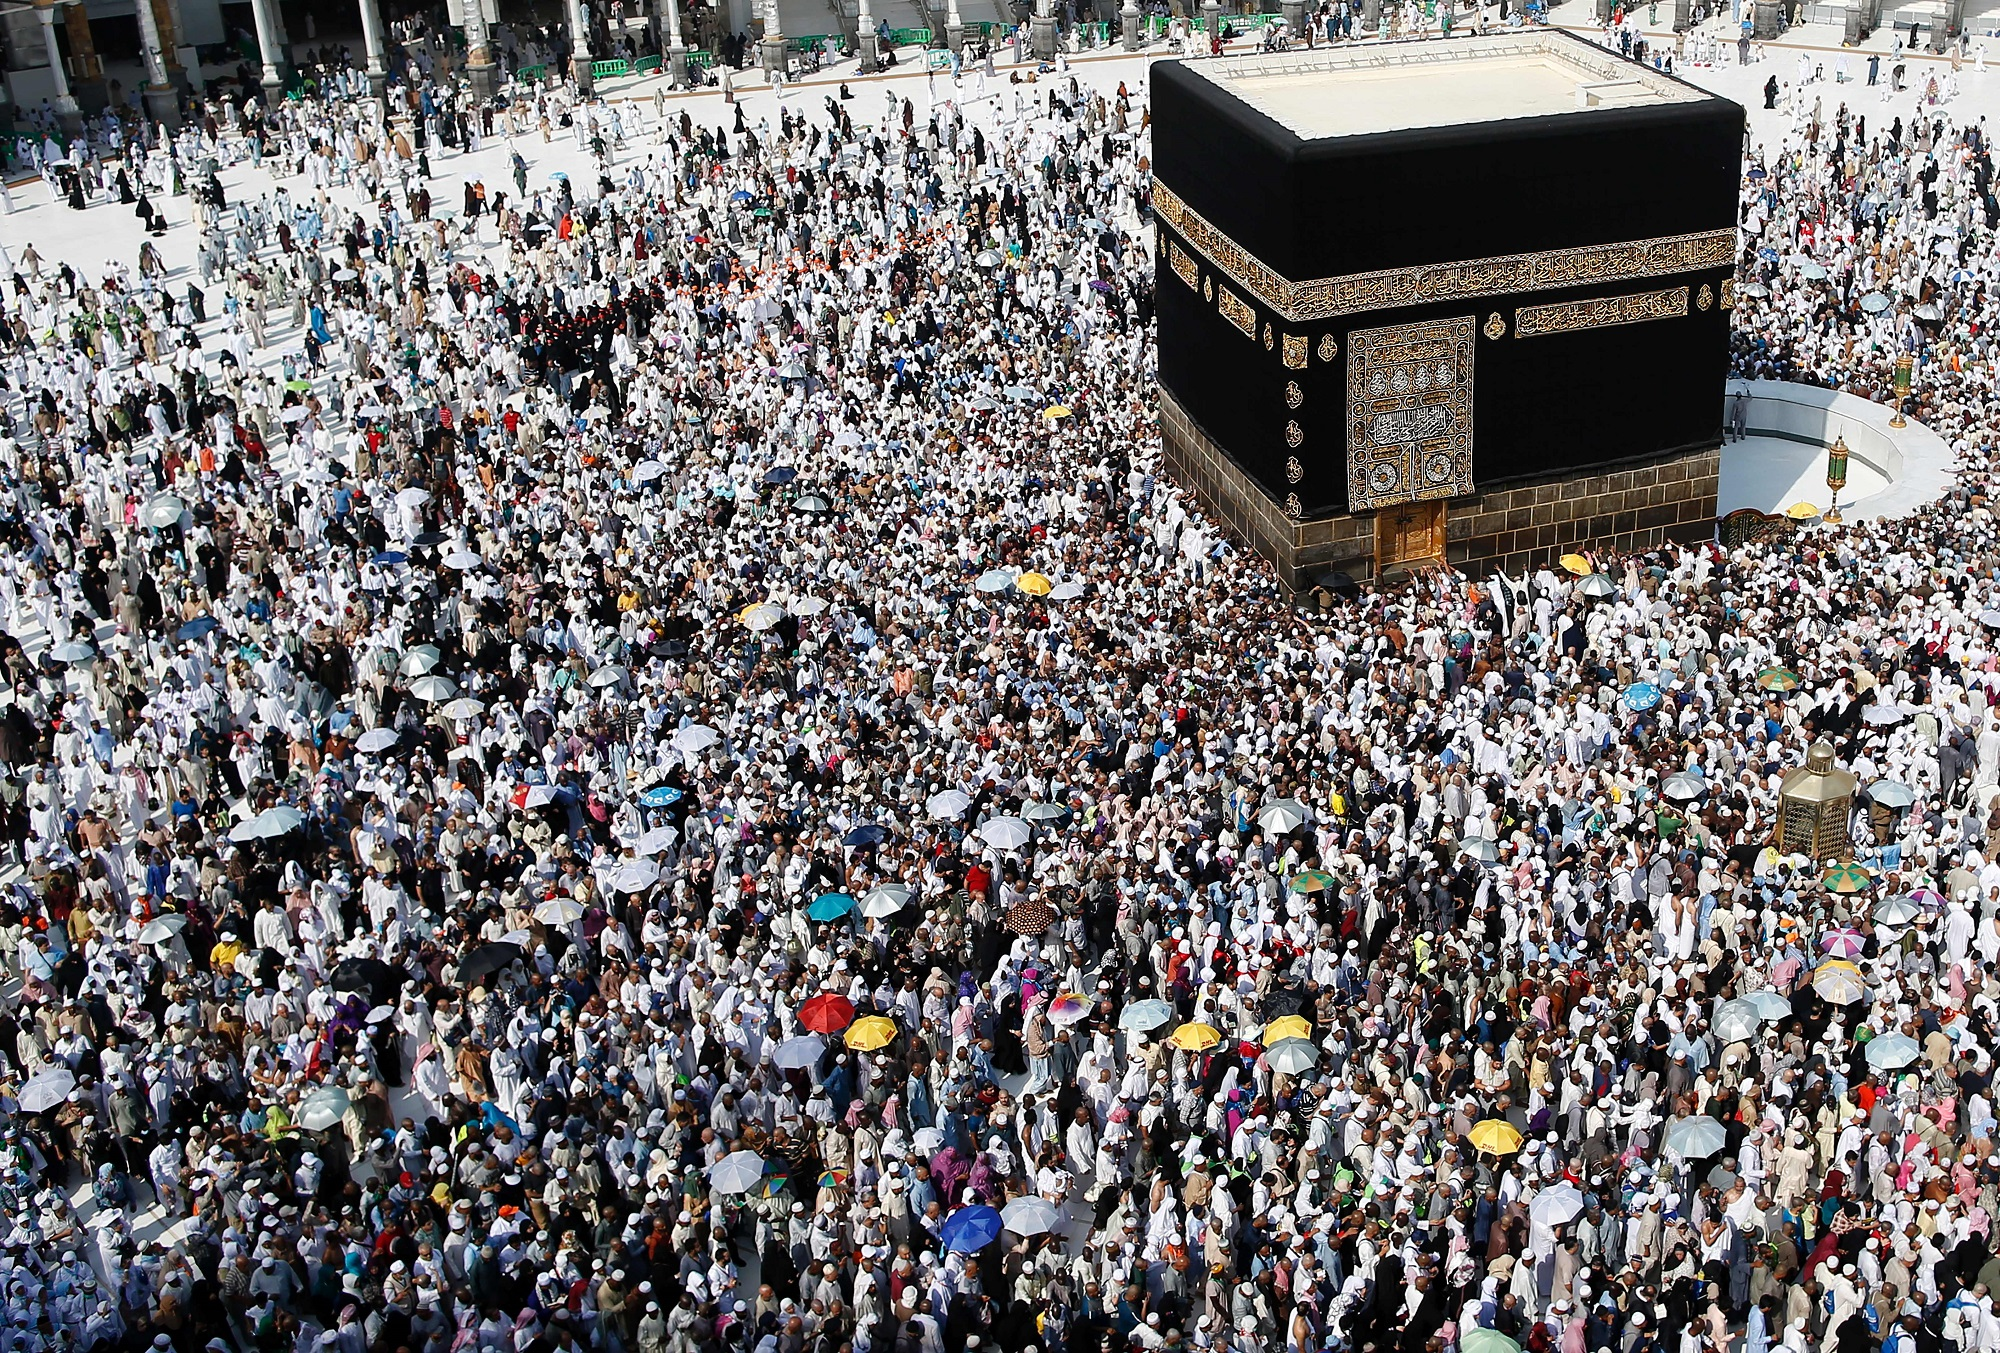 Saudi Arabia Hajj AFP Getty Images/AHMAD GHARABLI